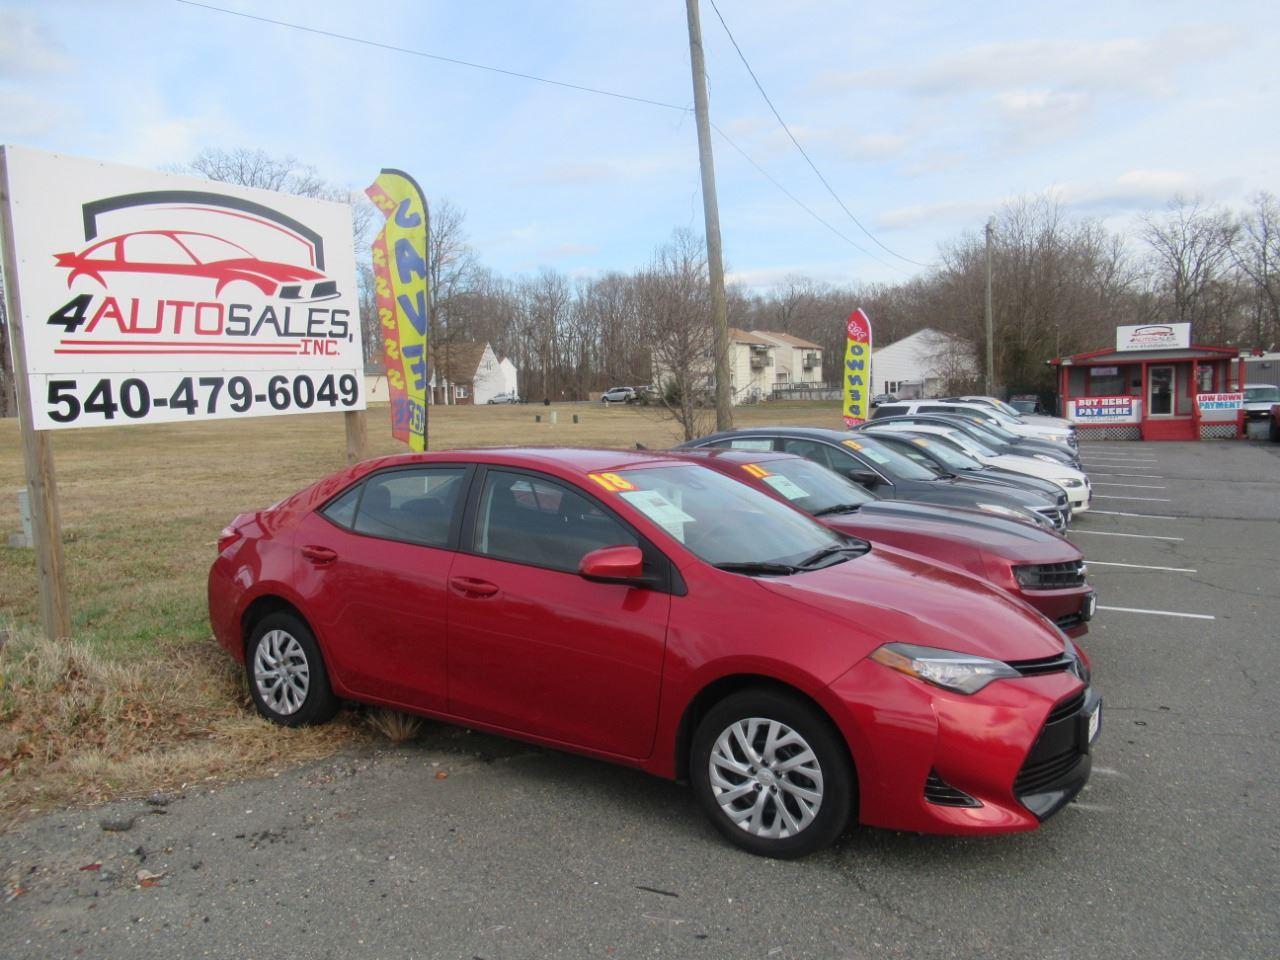 4Auto Sales, Inc.